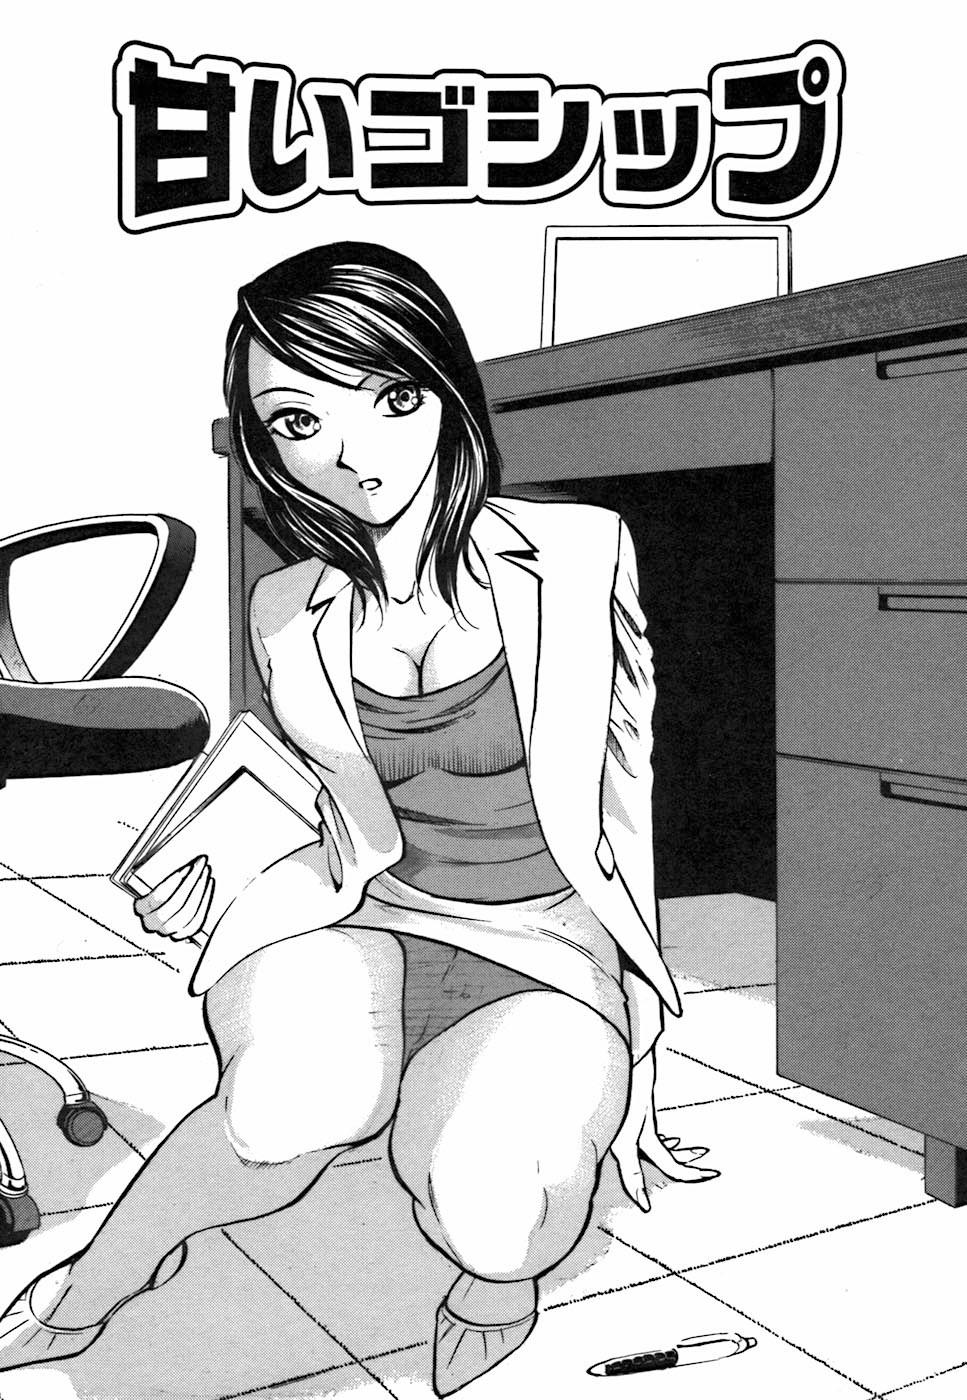 Kimi ga Nozomu Katachi | Appearance for which you hope 122